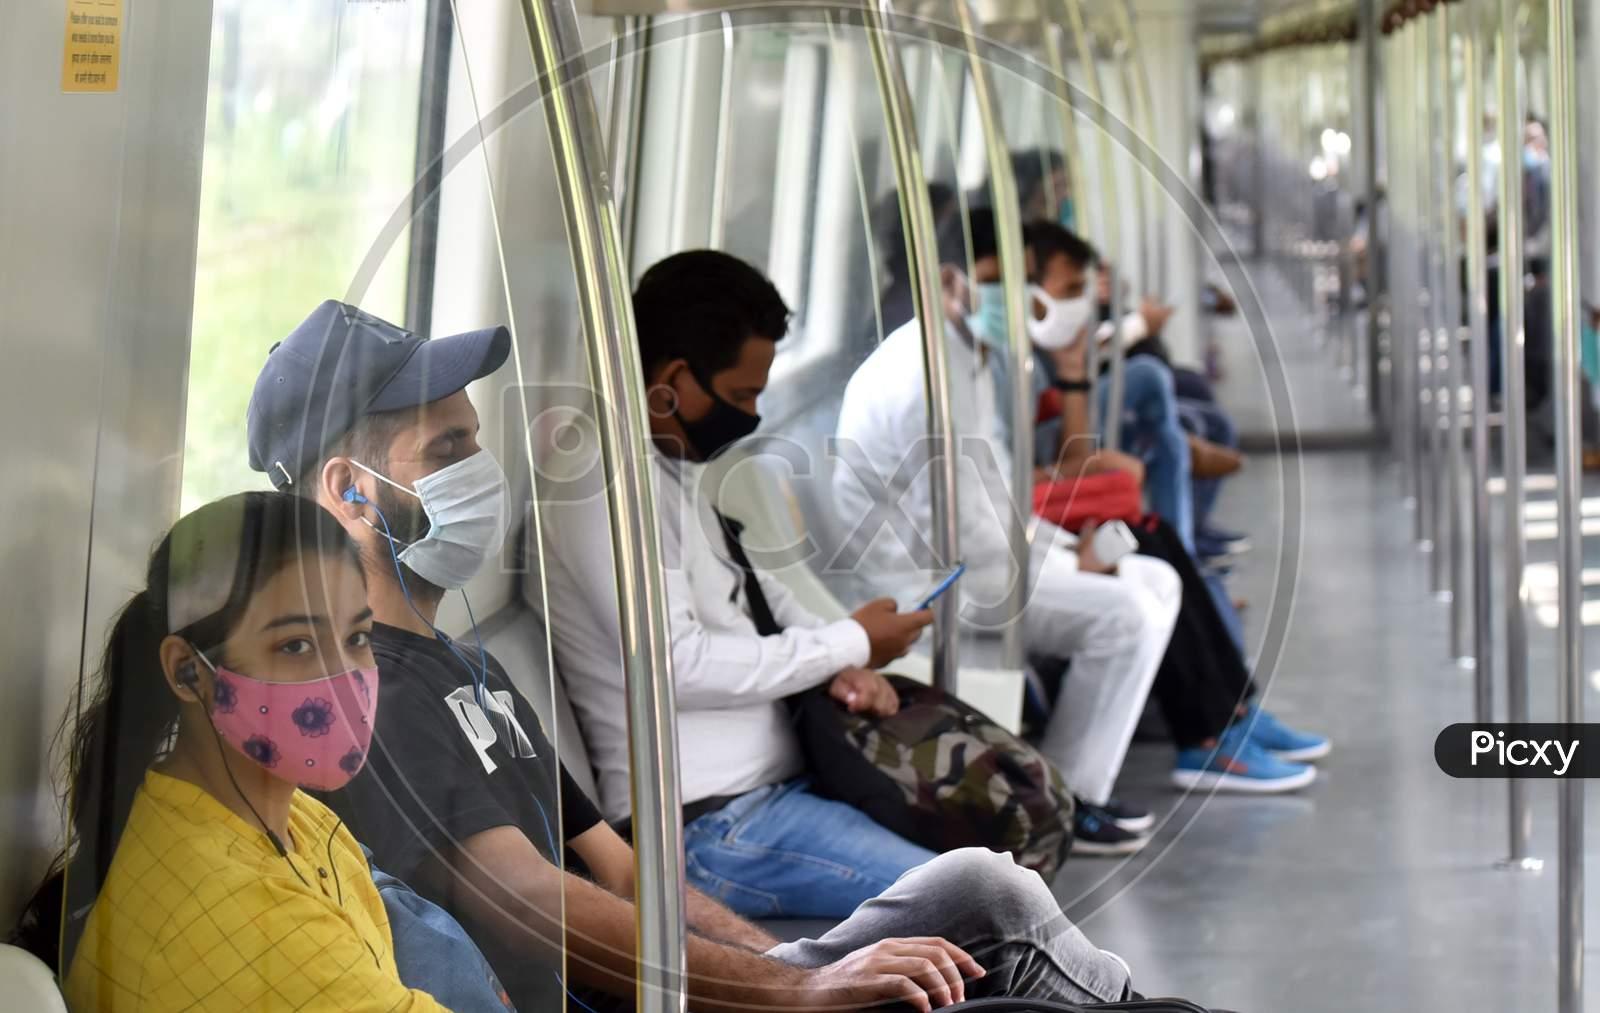 Passengers wearing face masks travel on a Delhi metro train, amidst the spread of coronavirus disease (COVID-19), in New Delhi, India, September 10, 2020.